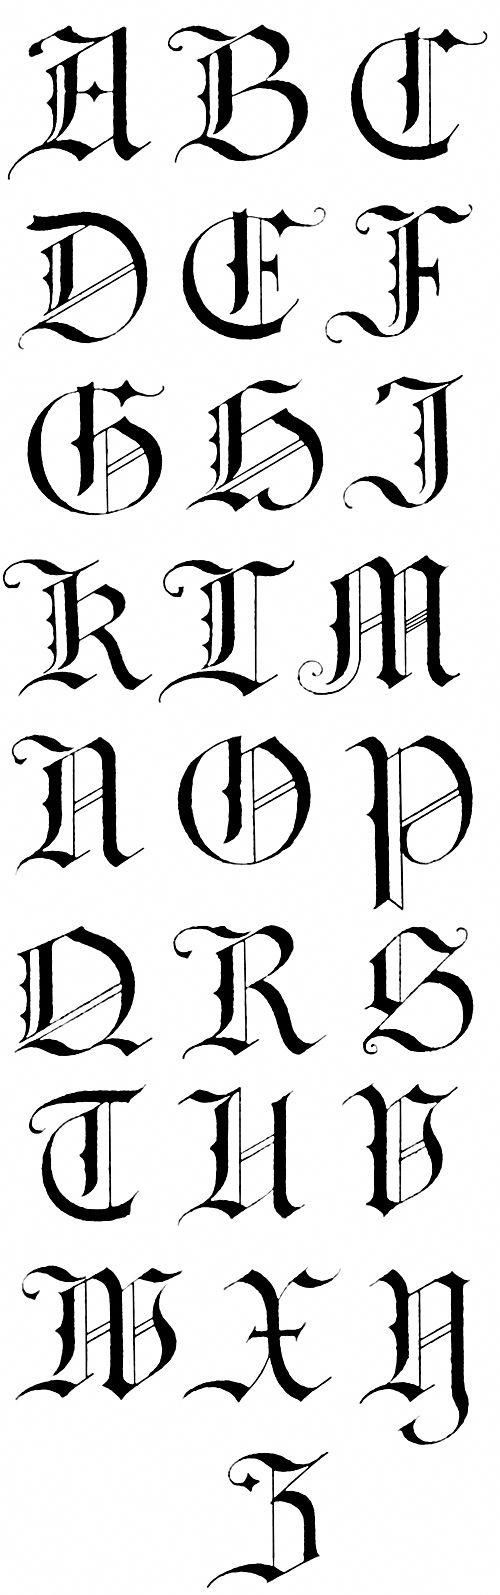 38+ Alphabet tribal pour tatouage inspirations